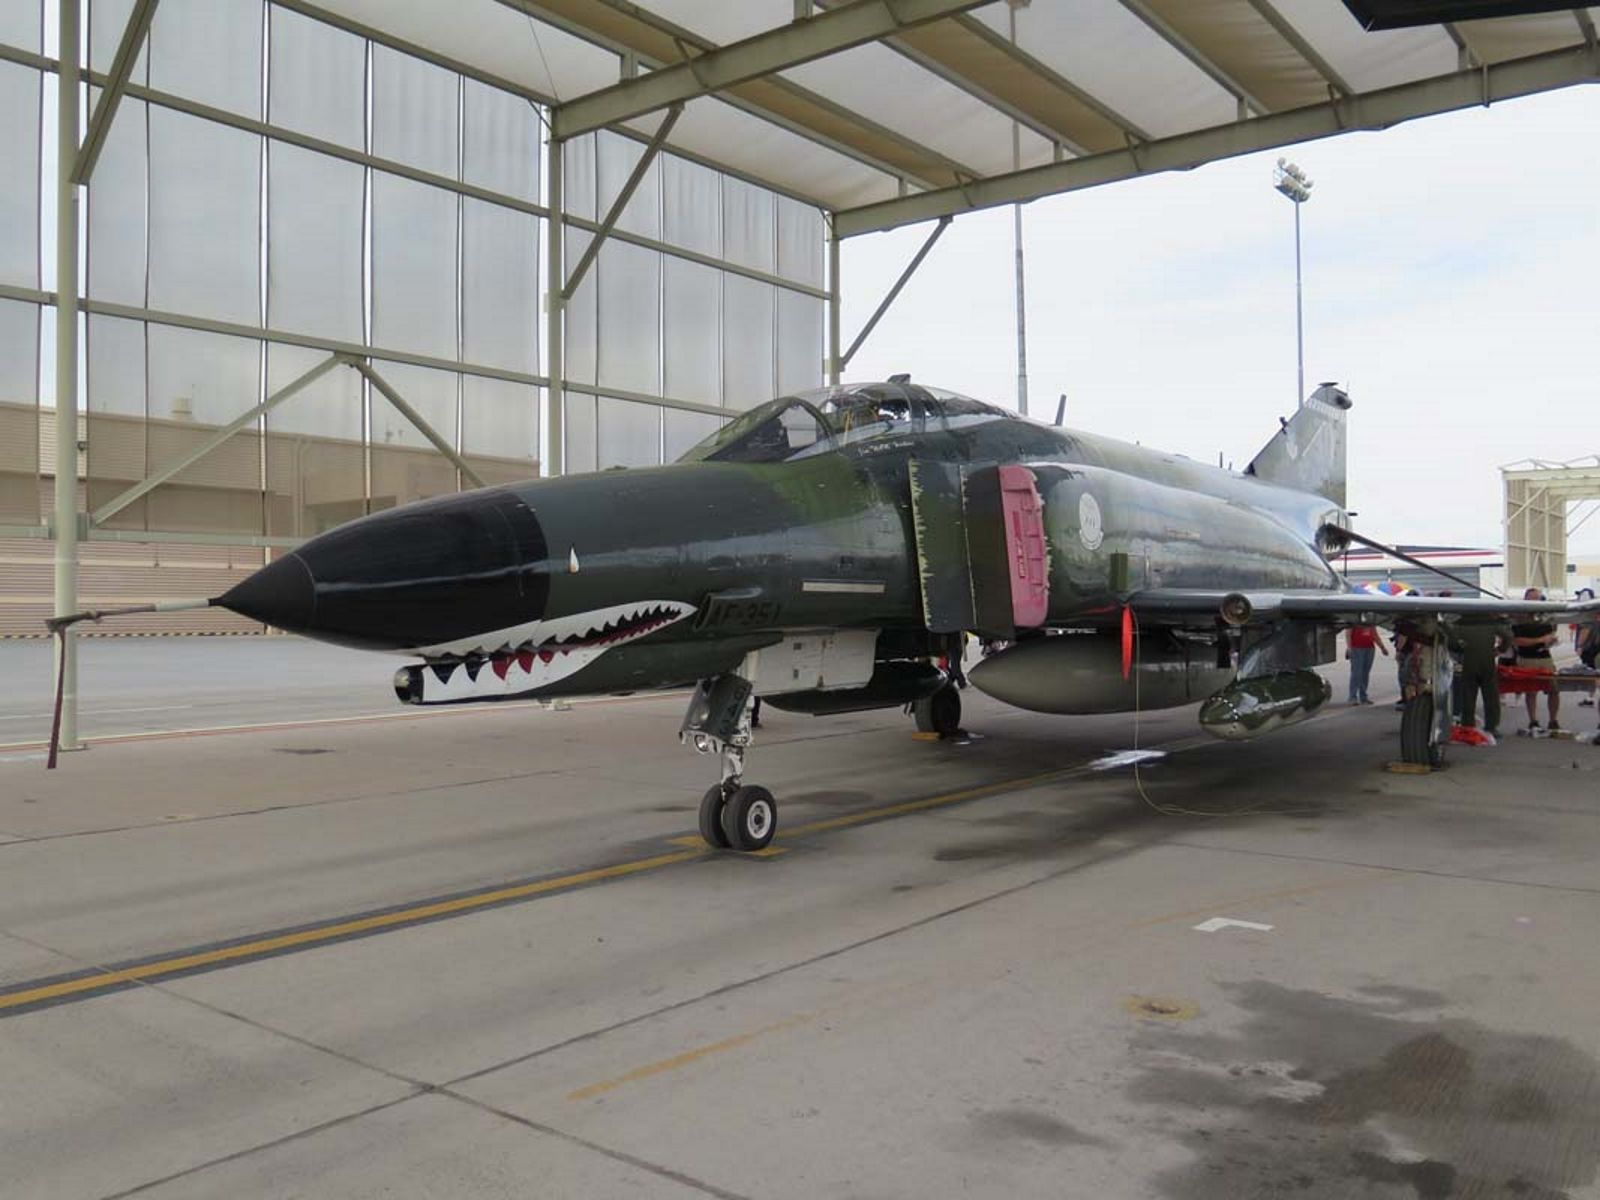 McDonnell Douglas F4 Phantom II WalkAround Airplane